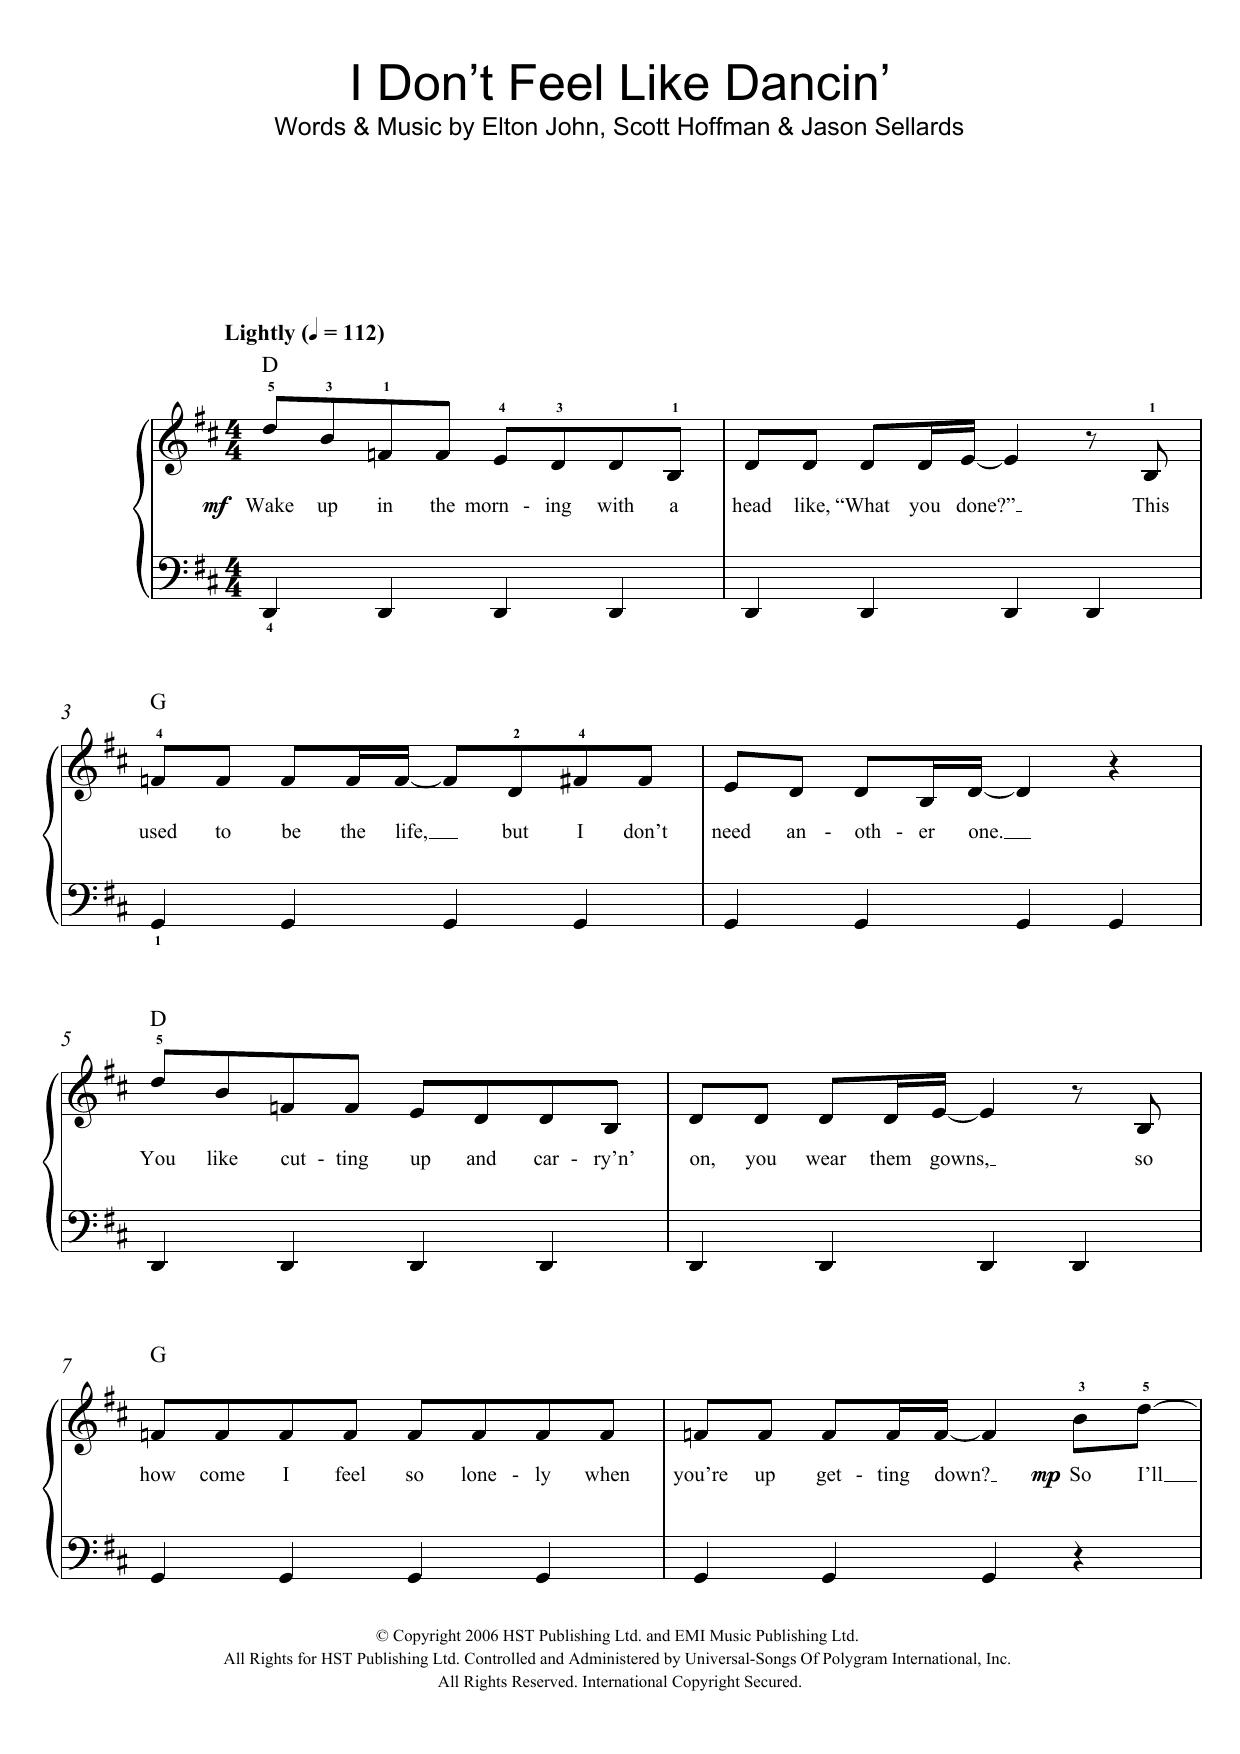 I Don't Feel Like Dancin' sheet music for piano solo (chords) by Scott Hoffman